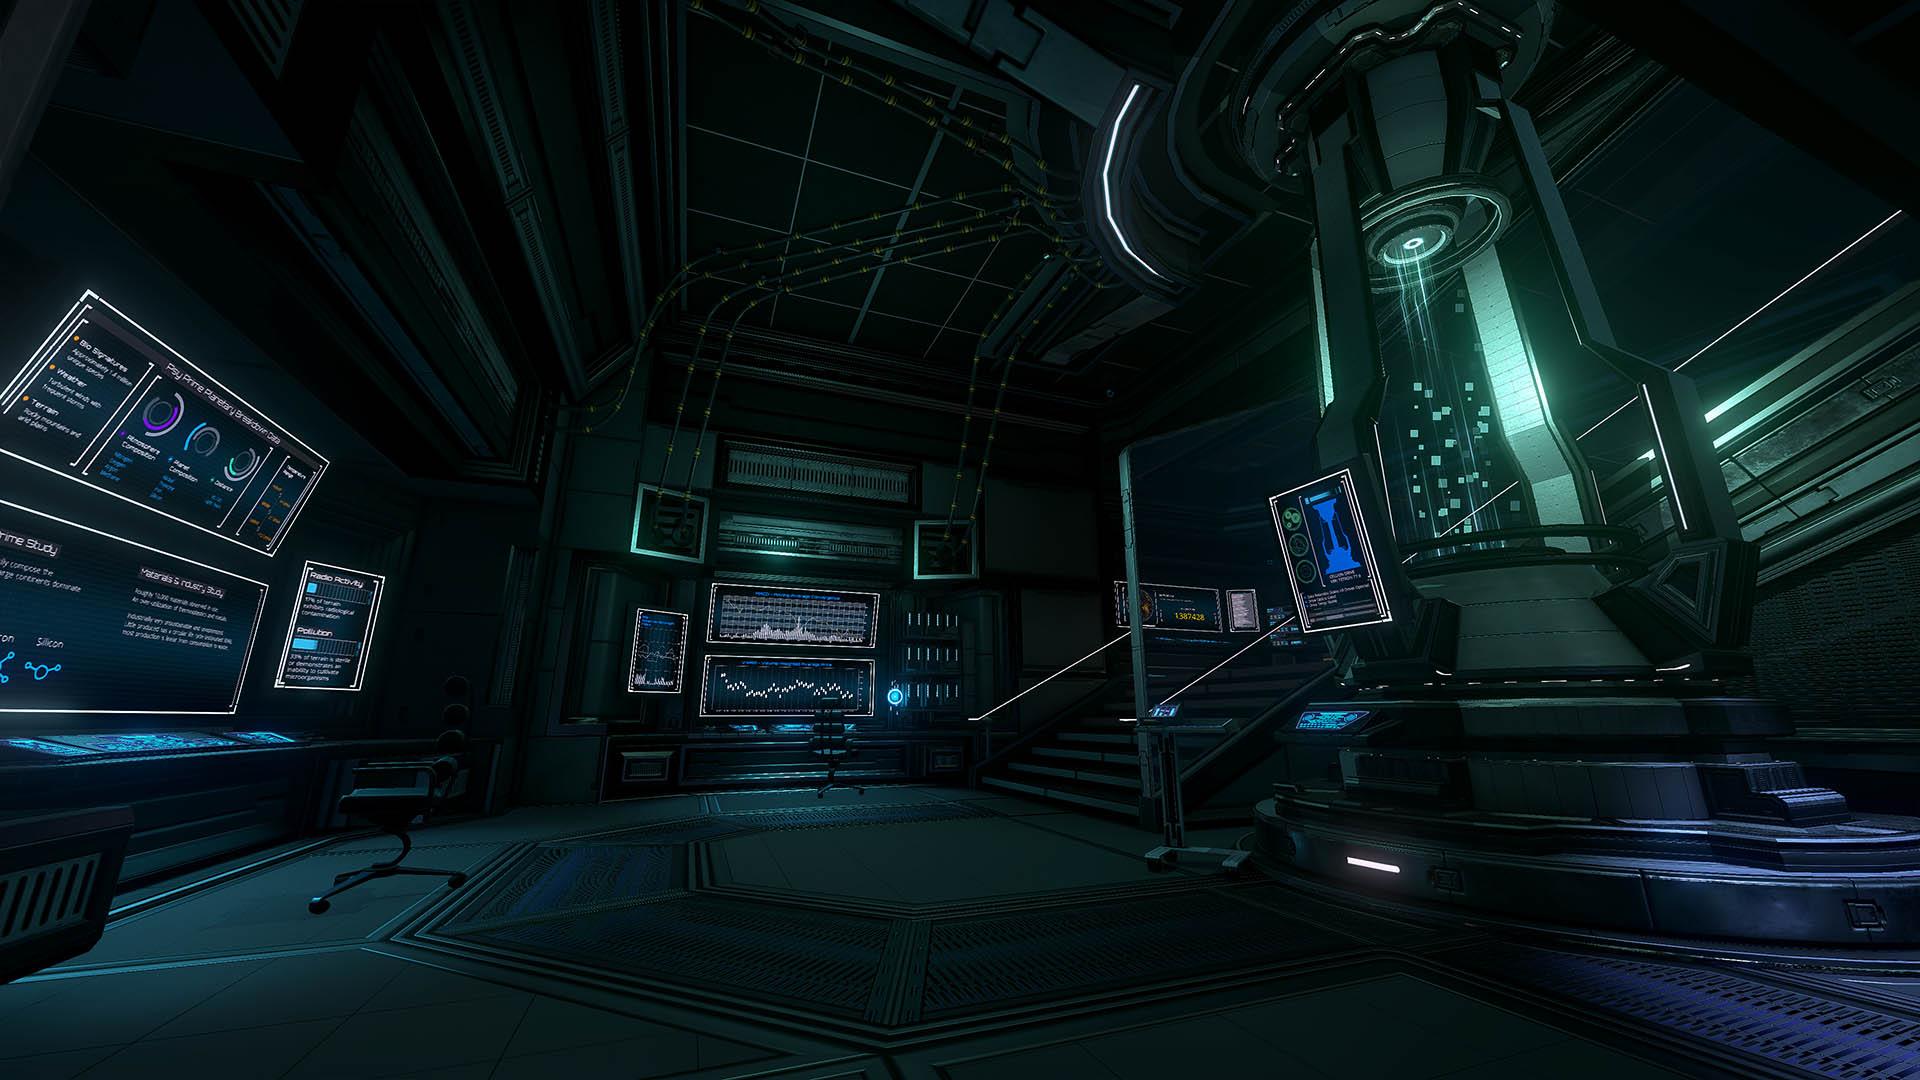 The Station скриншот 2